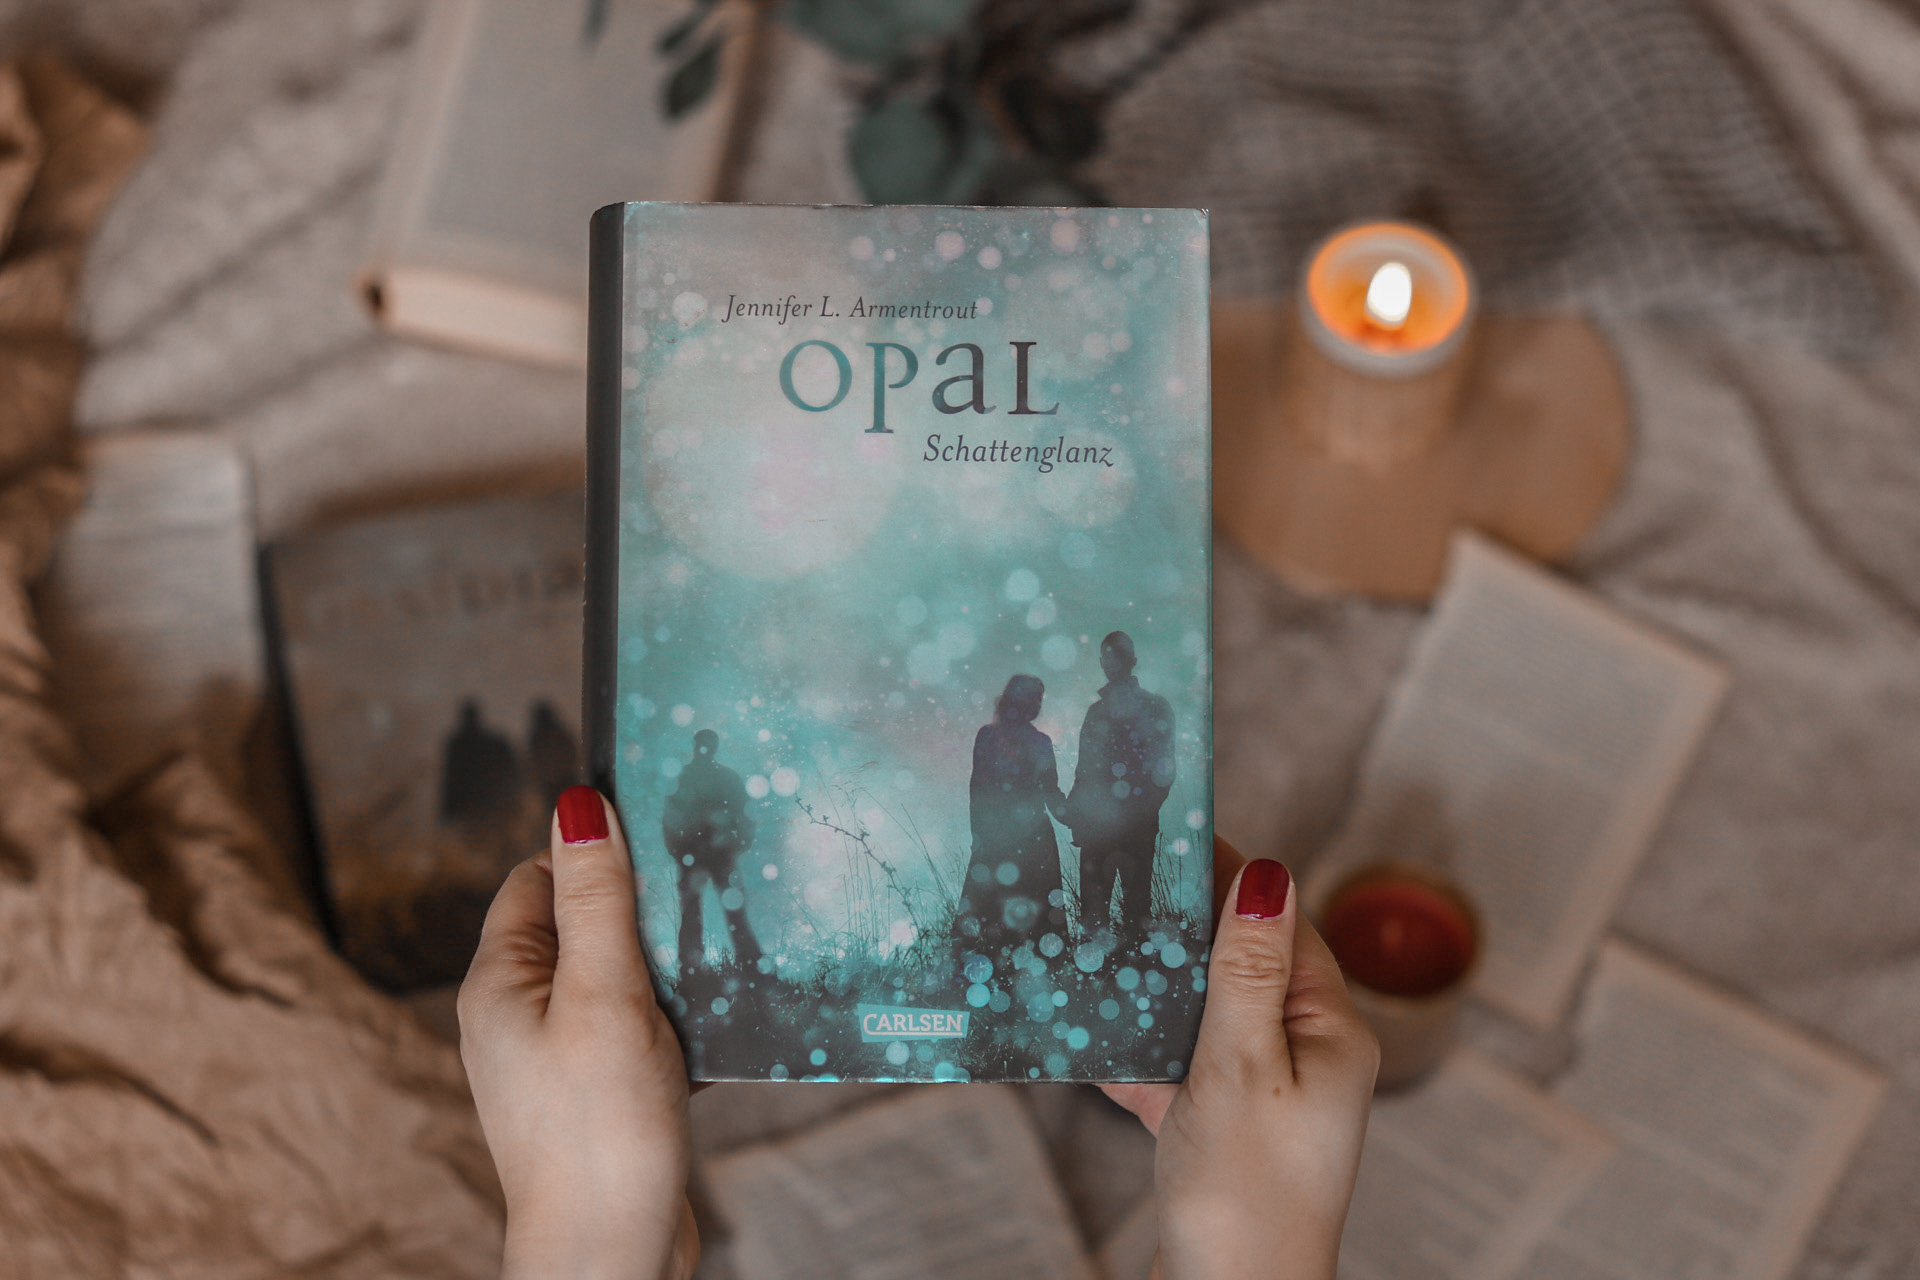 Opal – Schattenglanz | Jennifer L. Armentrout